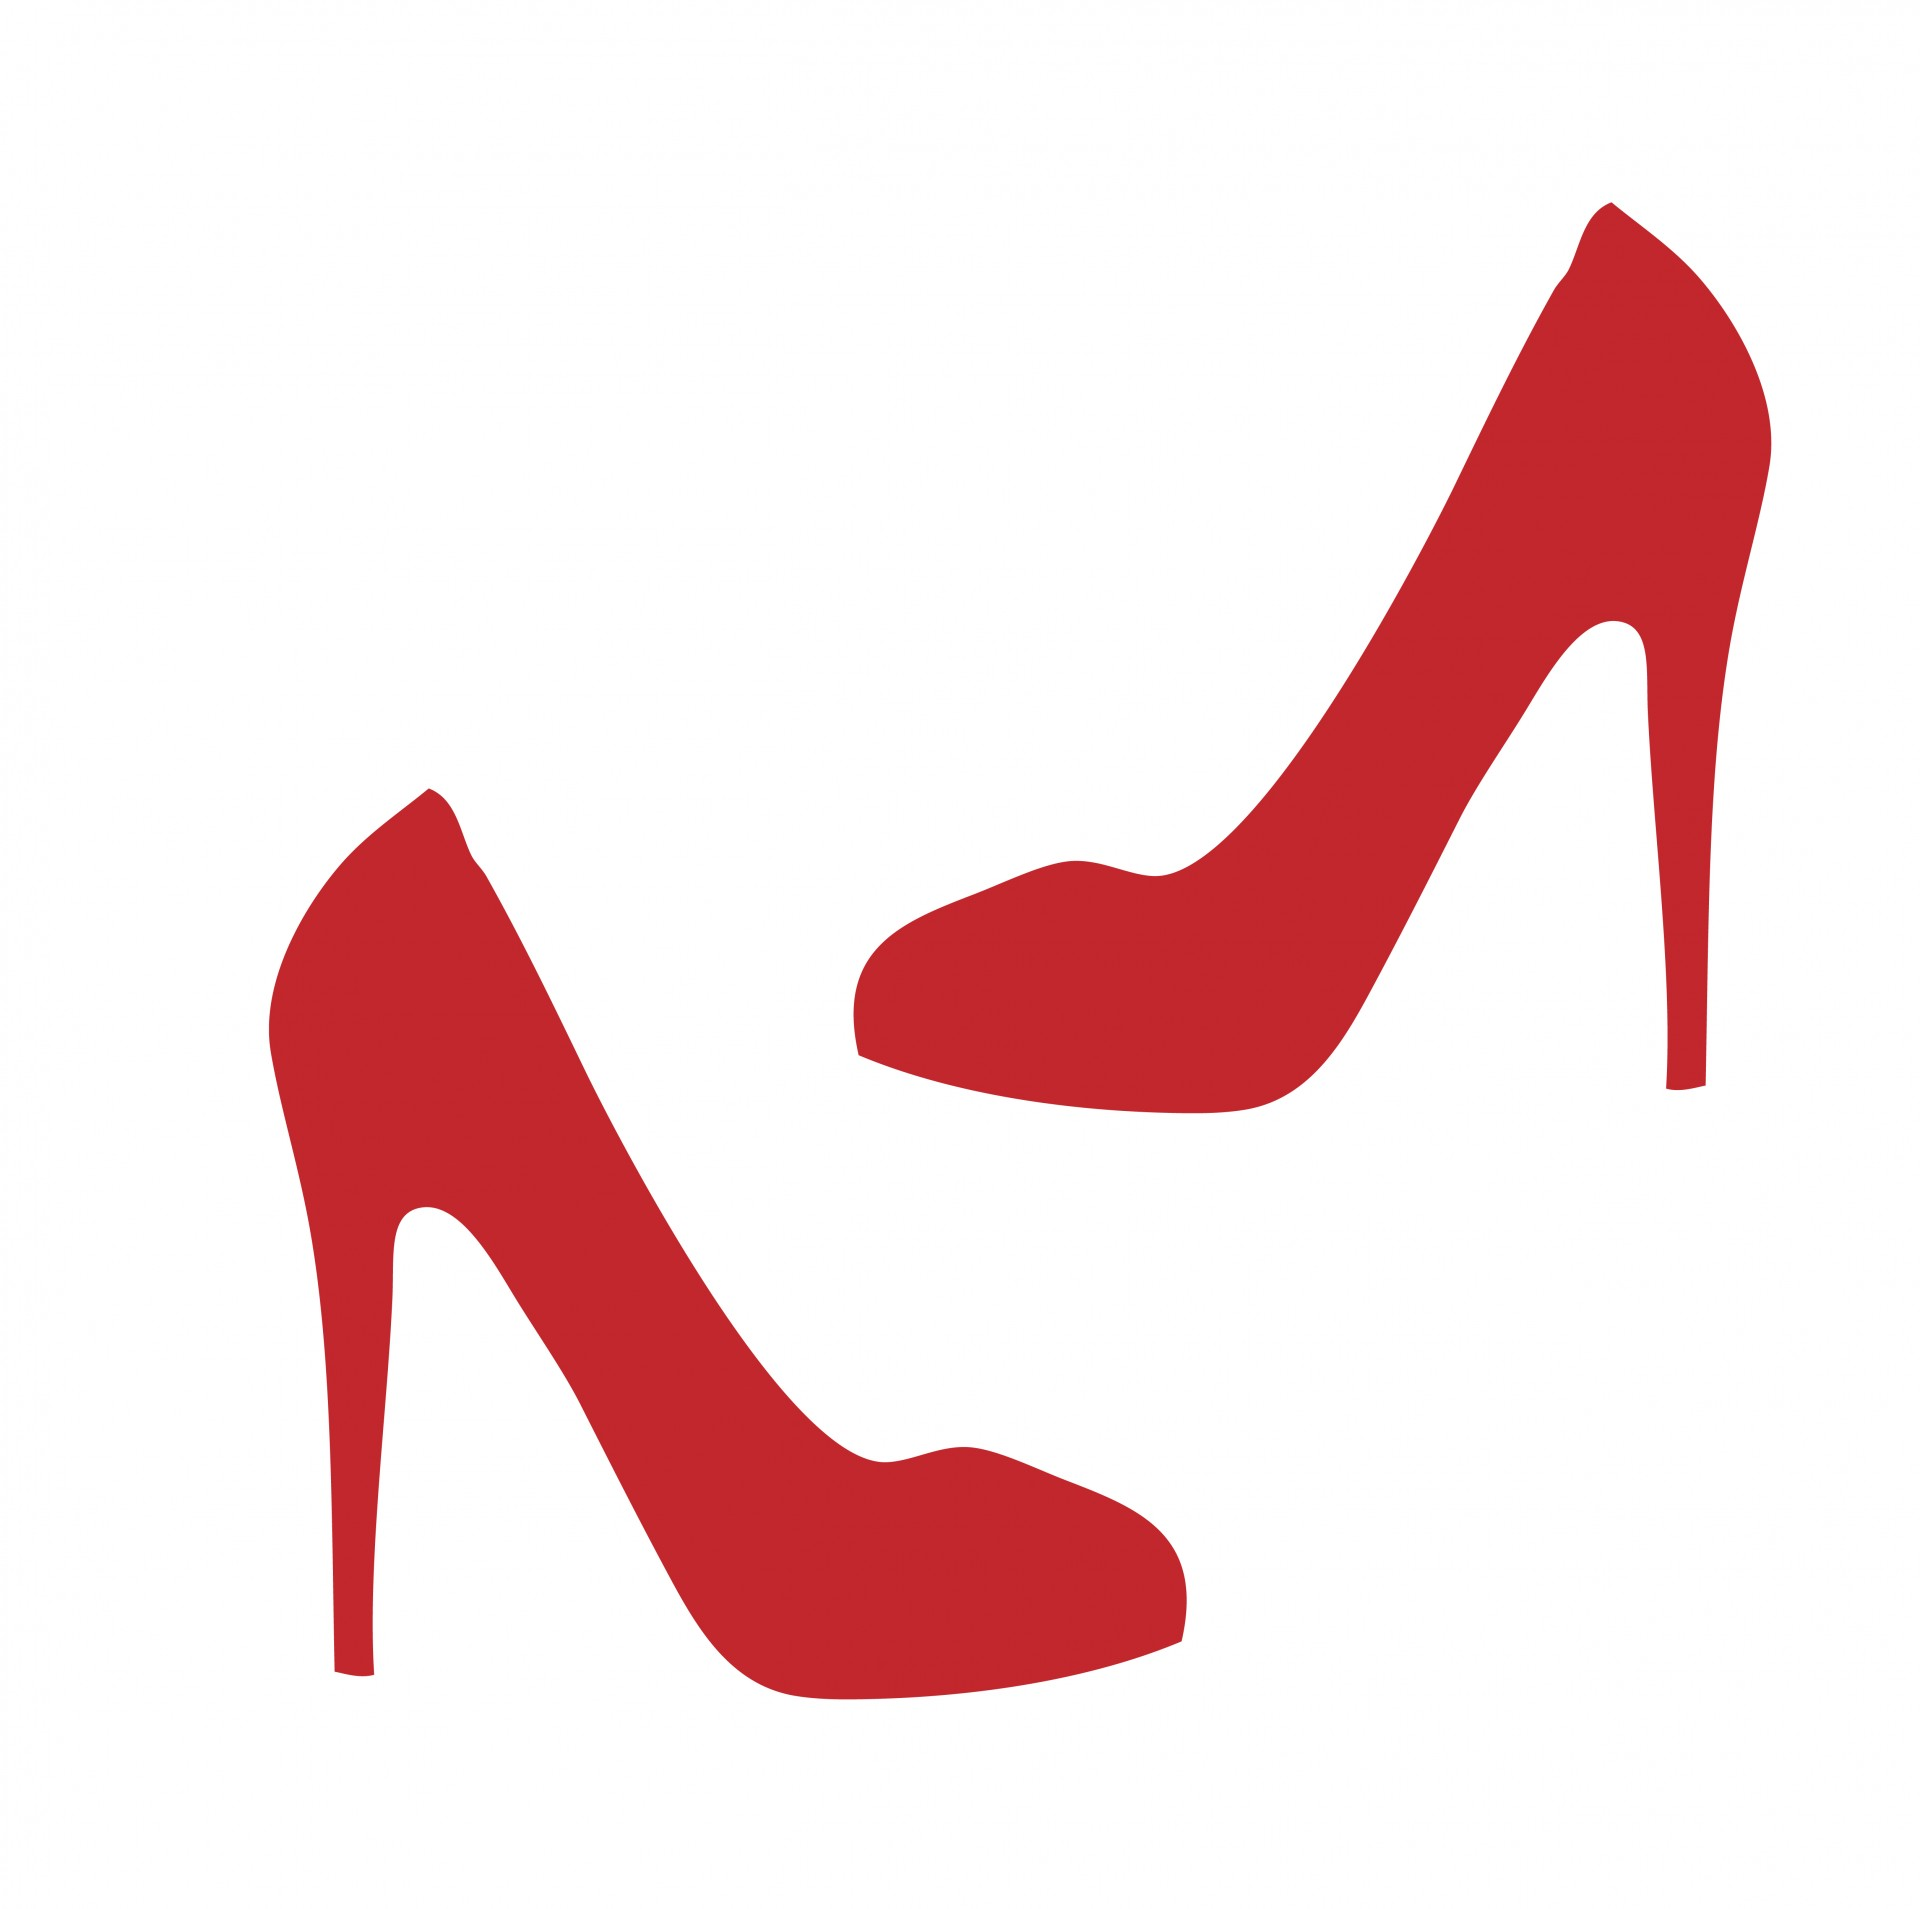 1920x1909 Clipart High Heels Red Shoe